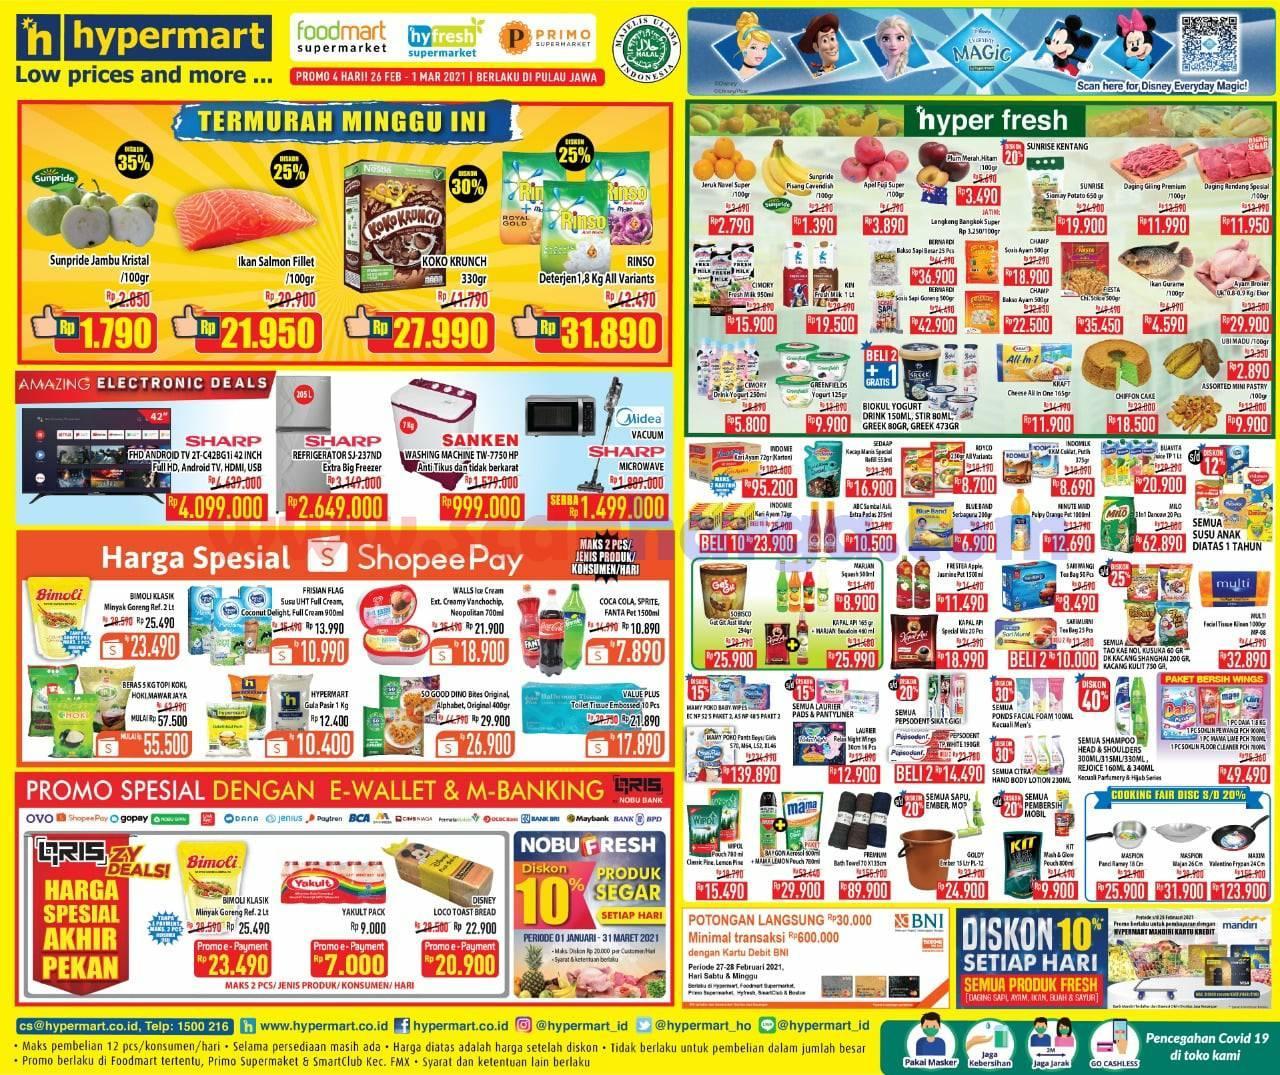 Katalog Promo Hypermart Weekend 26 Februari - 1 Maret 2021